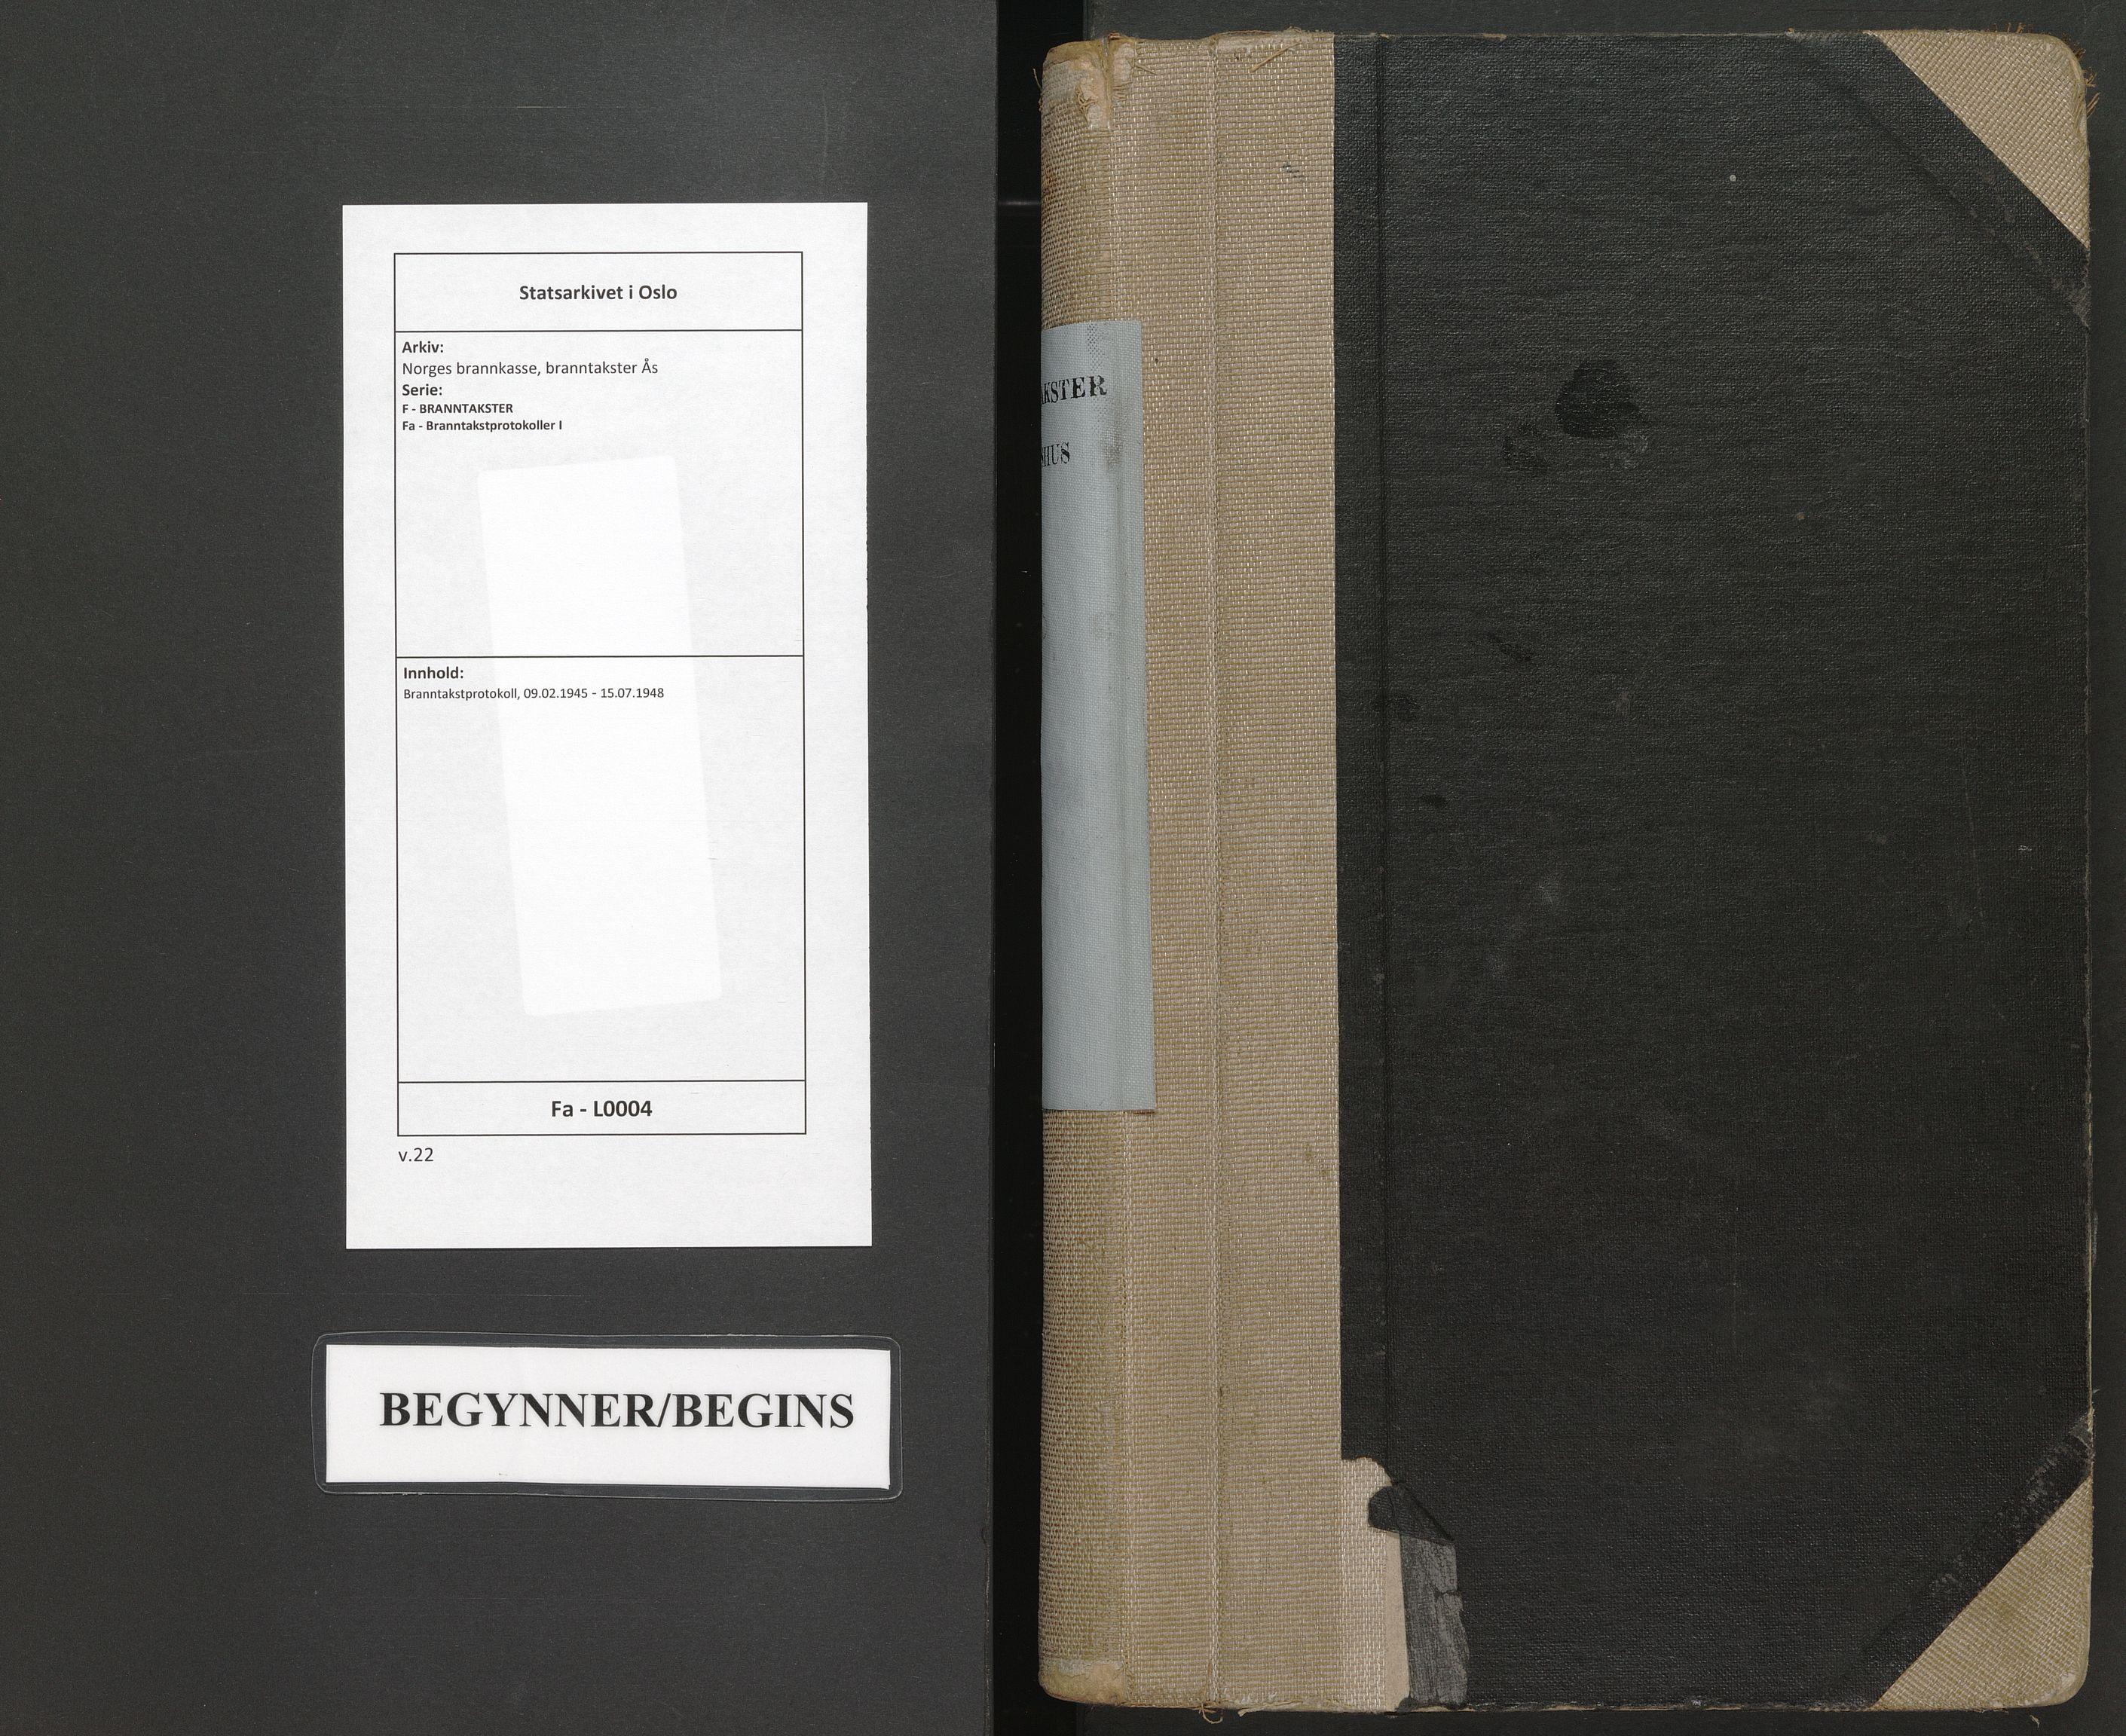 SAO, Norges brannkasse, branntakster Ås, F/Fa/L0004: Branntakstprotokoll, 1945-1948